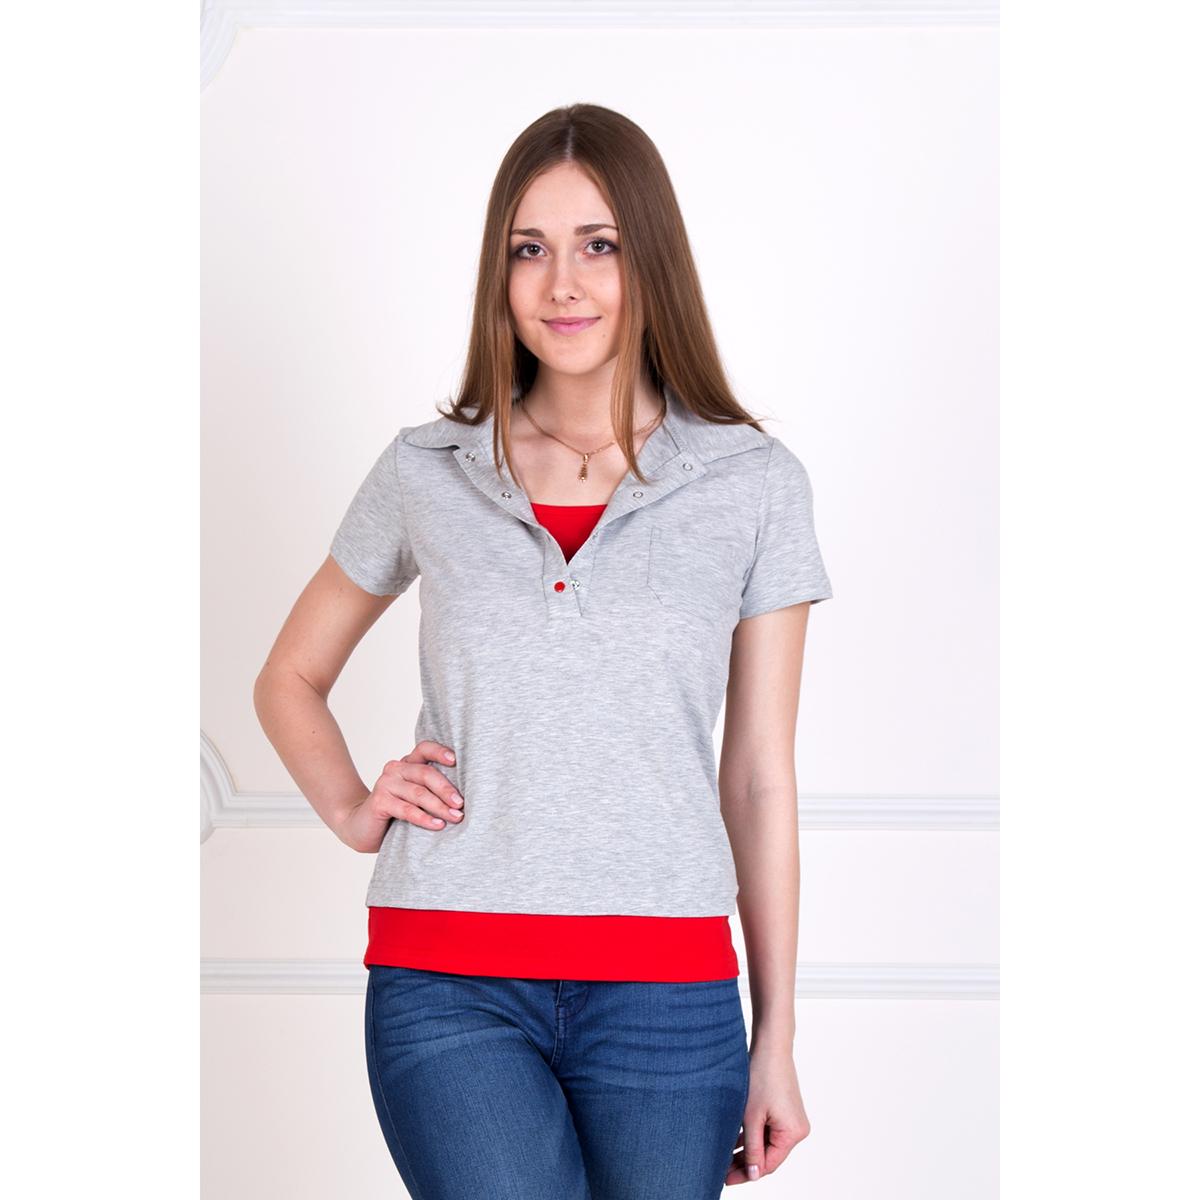 Женская футболка-поло Карина, размер 46Майки и футболки<br>Обхват груди:92 см<br>Обхват талии:74 см<br>Обхват бедер:100 см<br>Рост:167 см<br><br>Тип: Жен. футболка<br>Размер: 46<br>Материал: Фулайкра